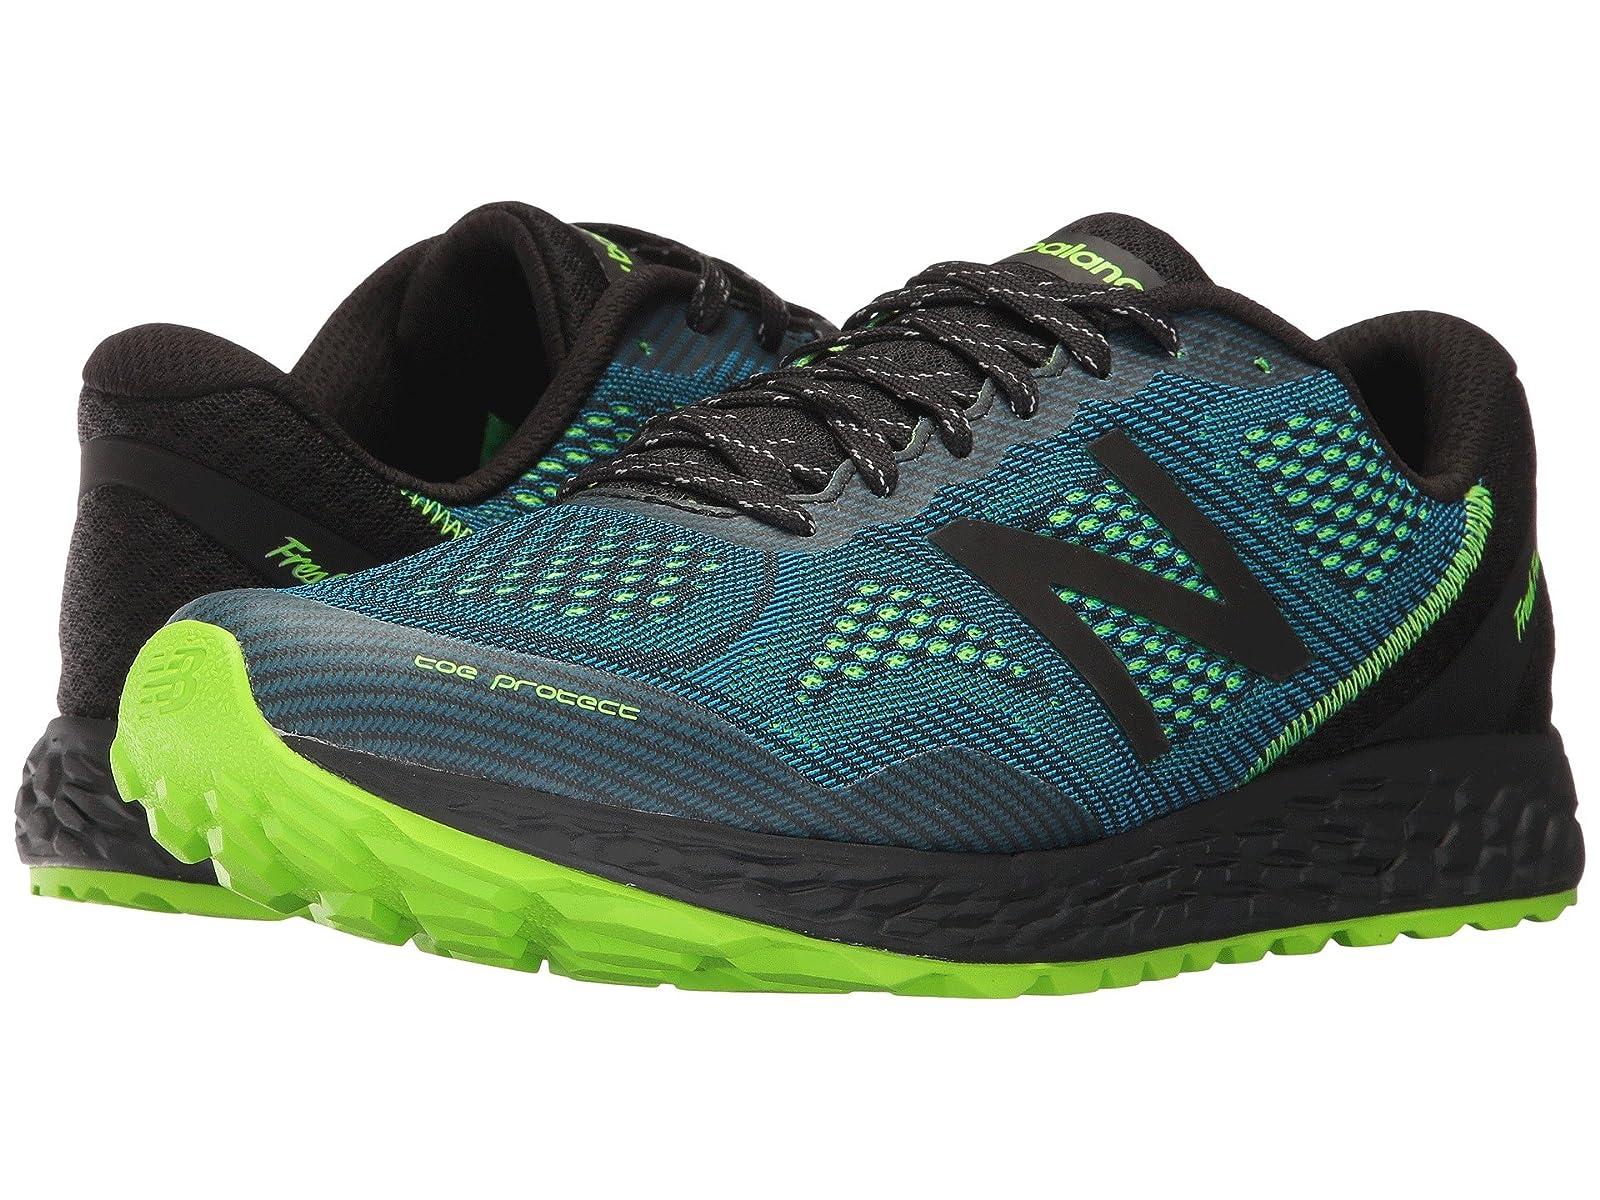 New Balance Fresh Foam Gobi v2Atmospheric grades have affordable shoes